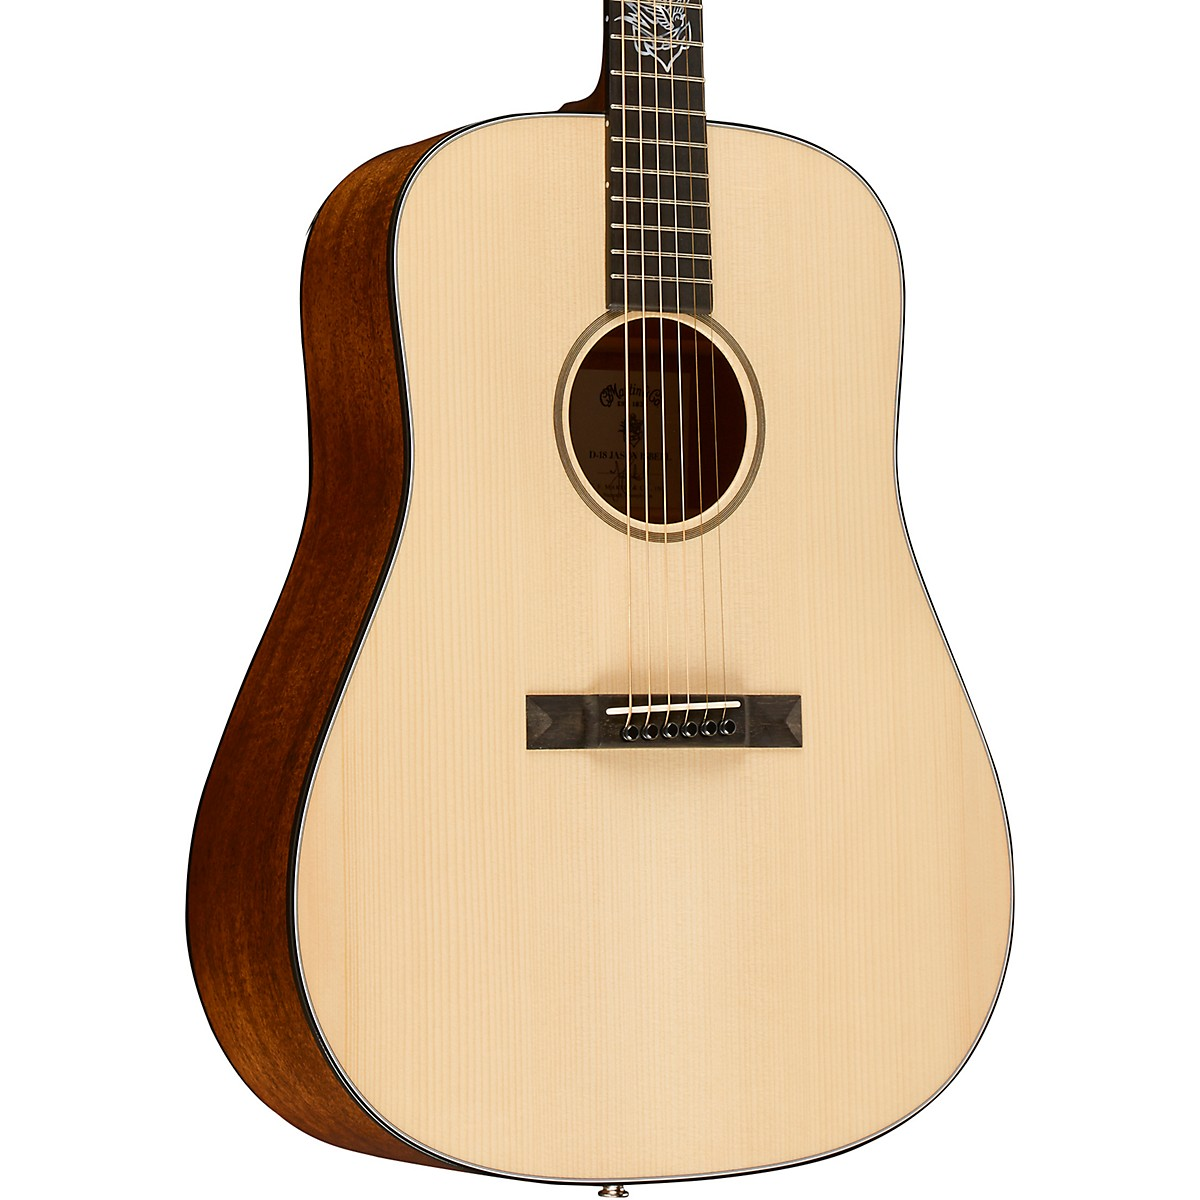 Martin D-18 Jason Isbell Custom Signature Edition Dreadnought Acoustic-Electric Guitar